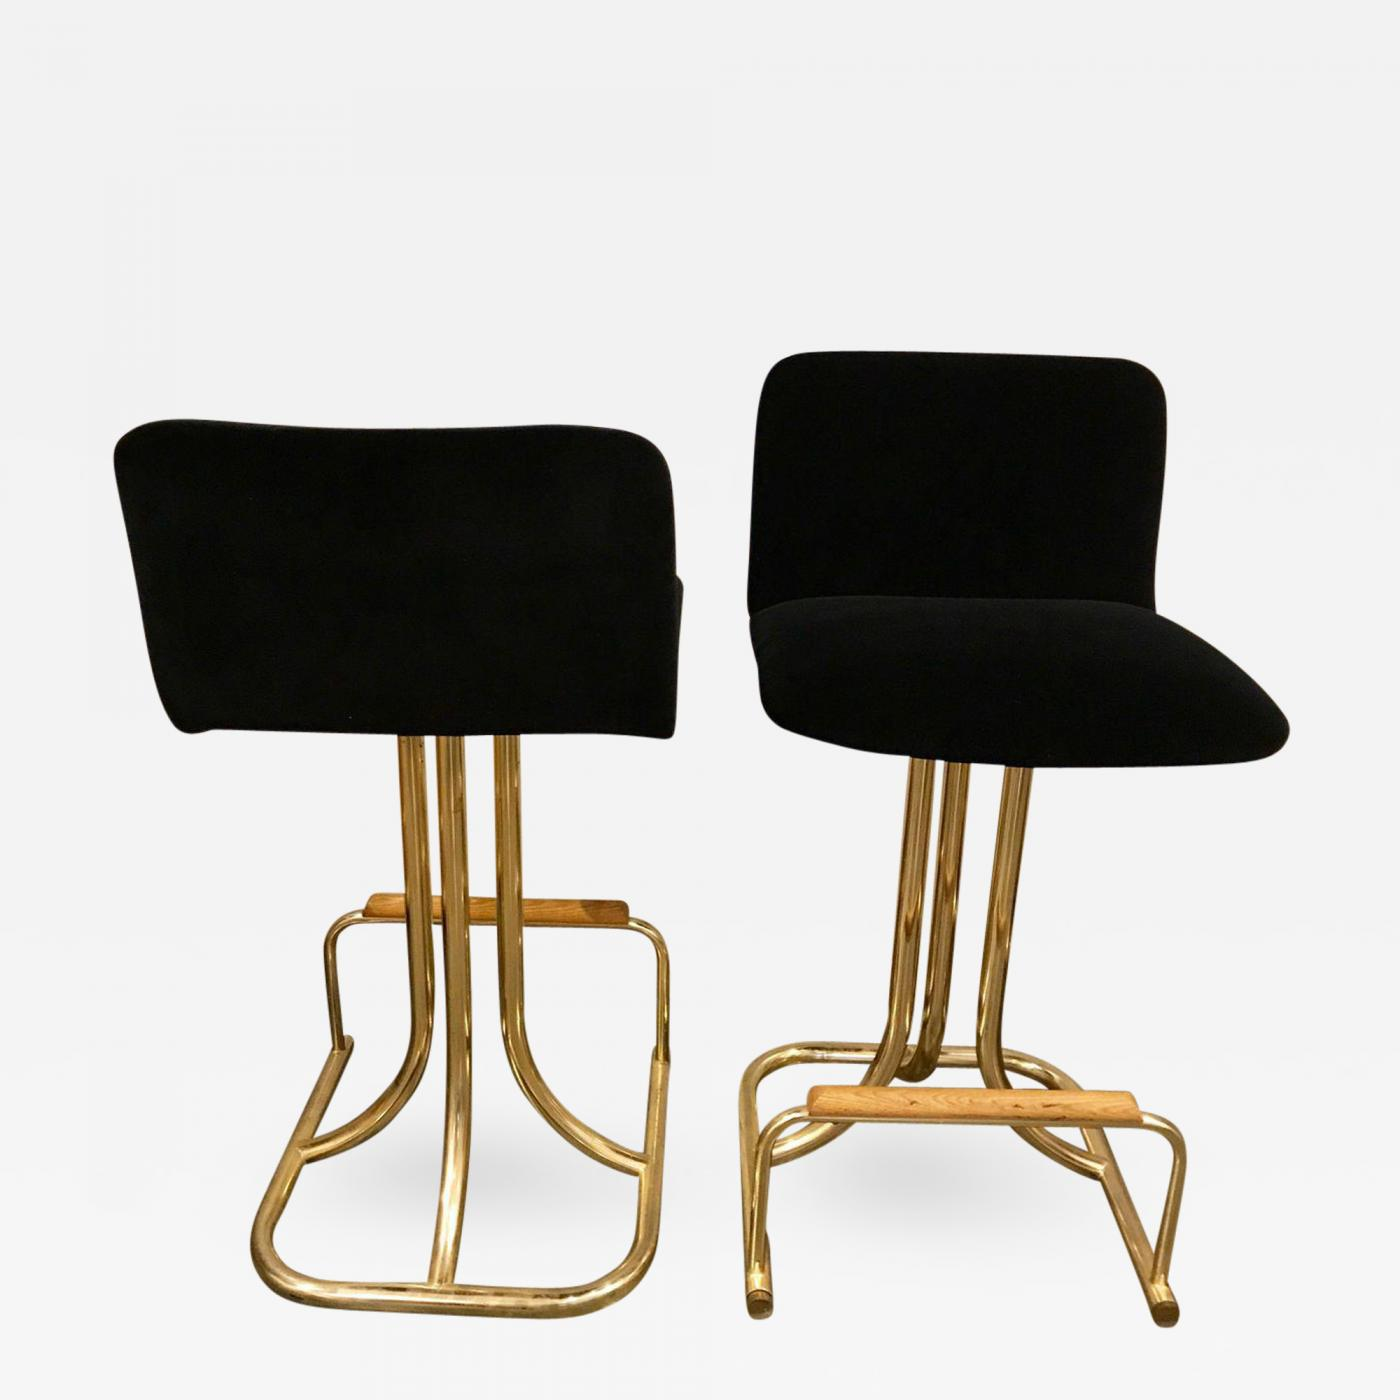 Incredible Design Institute America 2 Sets Of 4 Mid Century Modern Black Velvet Brass Wood Bar Stools Cjindustries Chair Design For Home Cjindustriesco